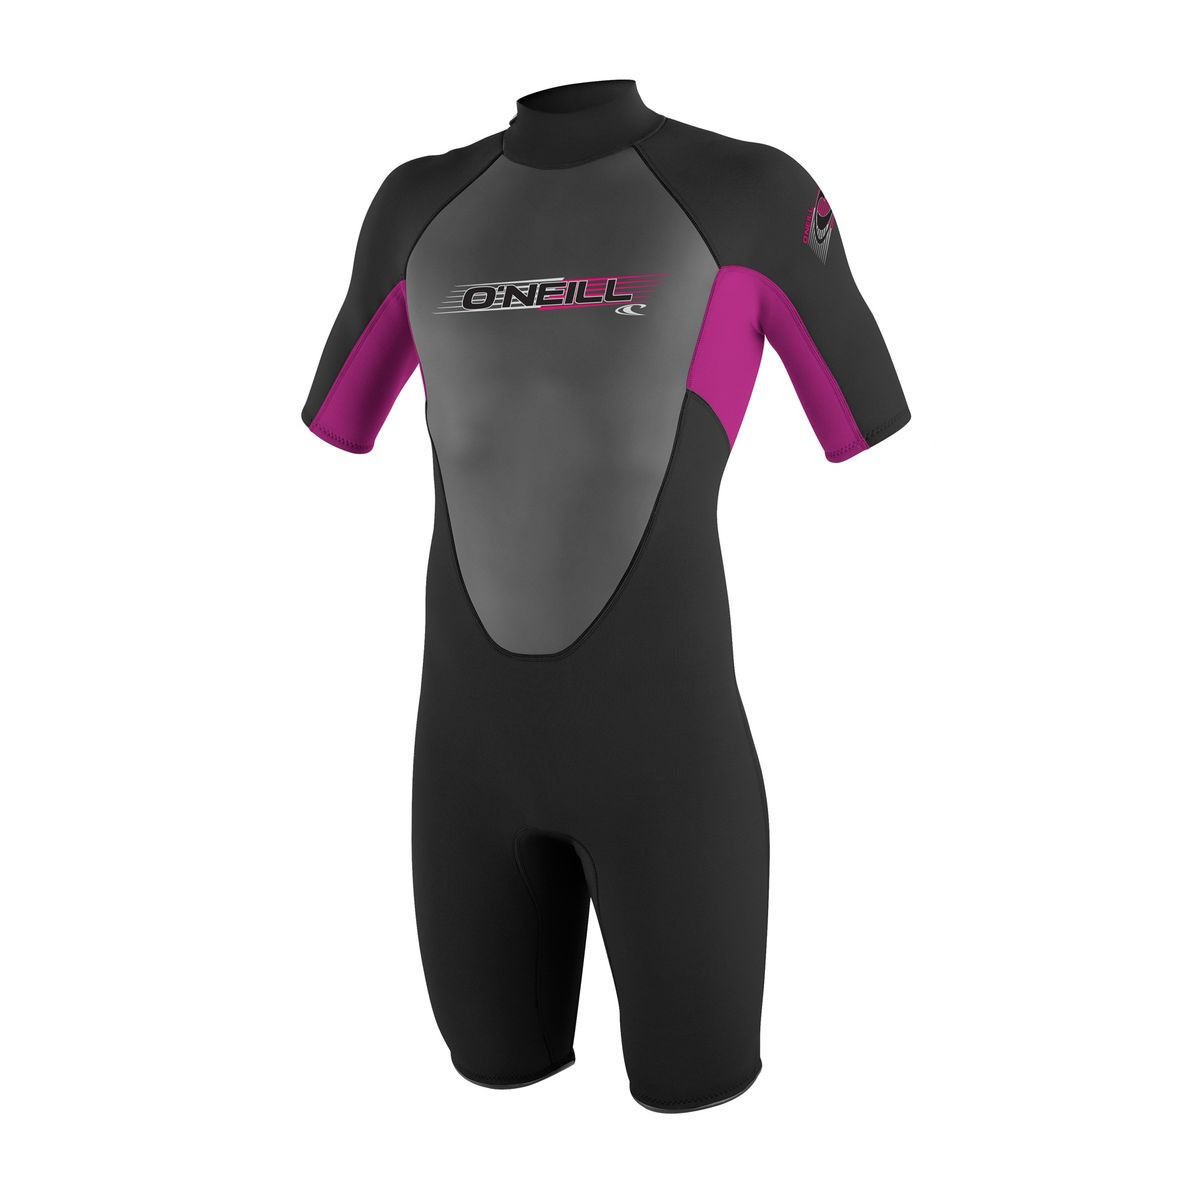 O'Neill Junior Reactor 2mm Shorty Wetsuit - Black/Fox Pink